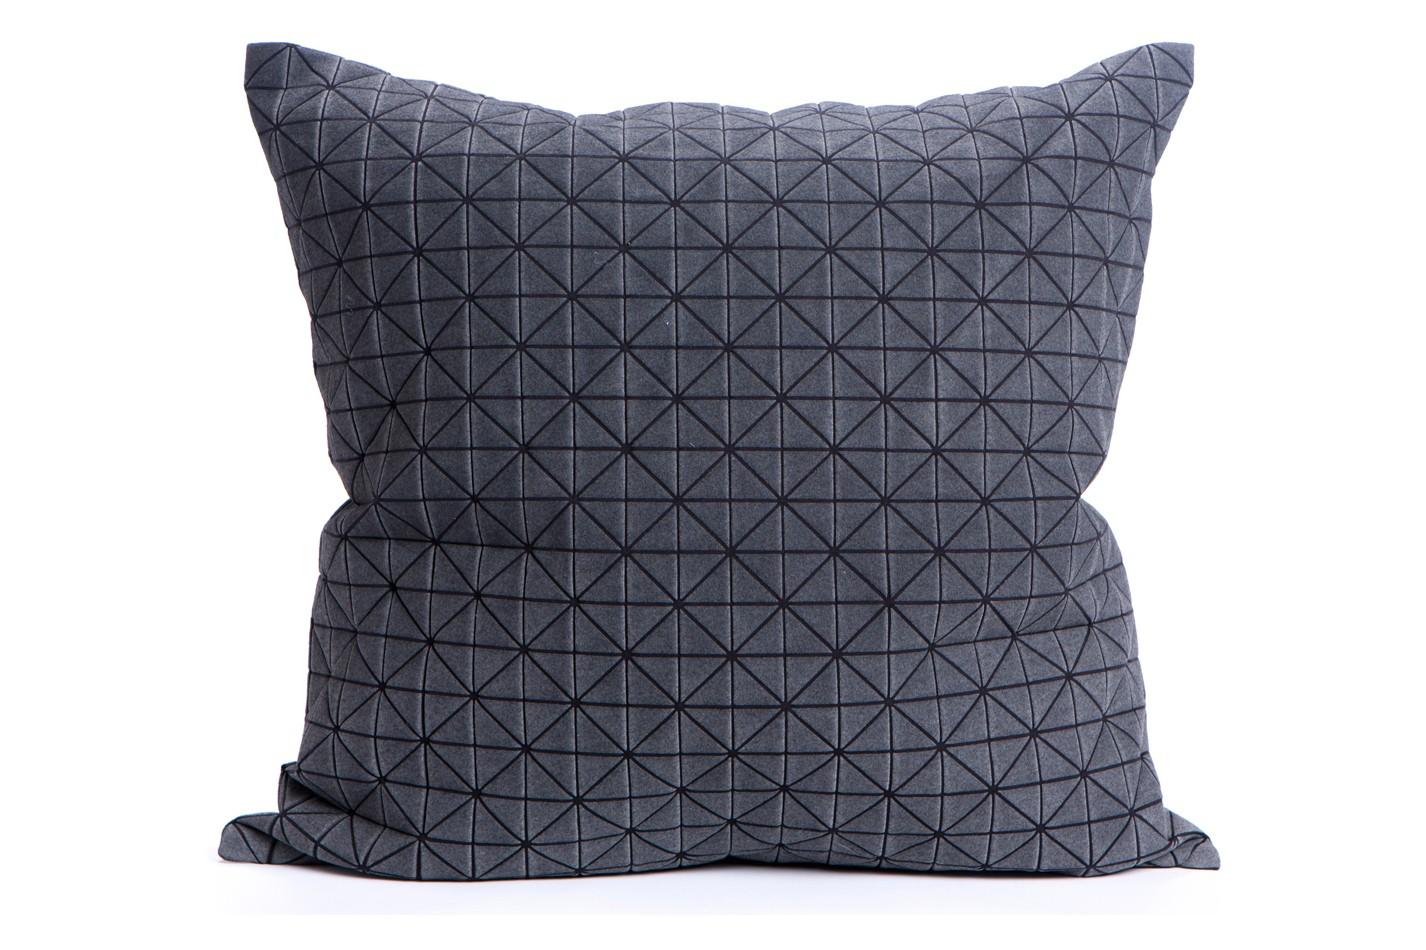 Geo Origami Square Cushion Cover Black